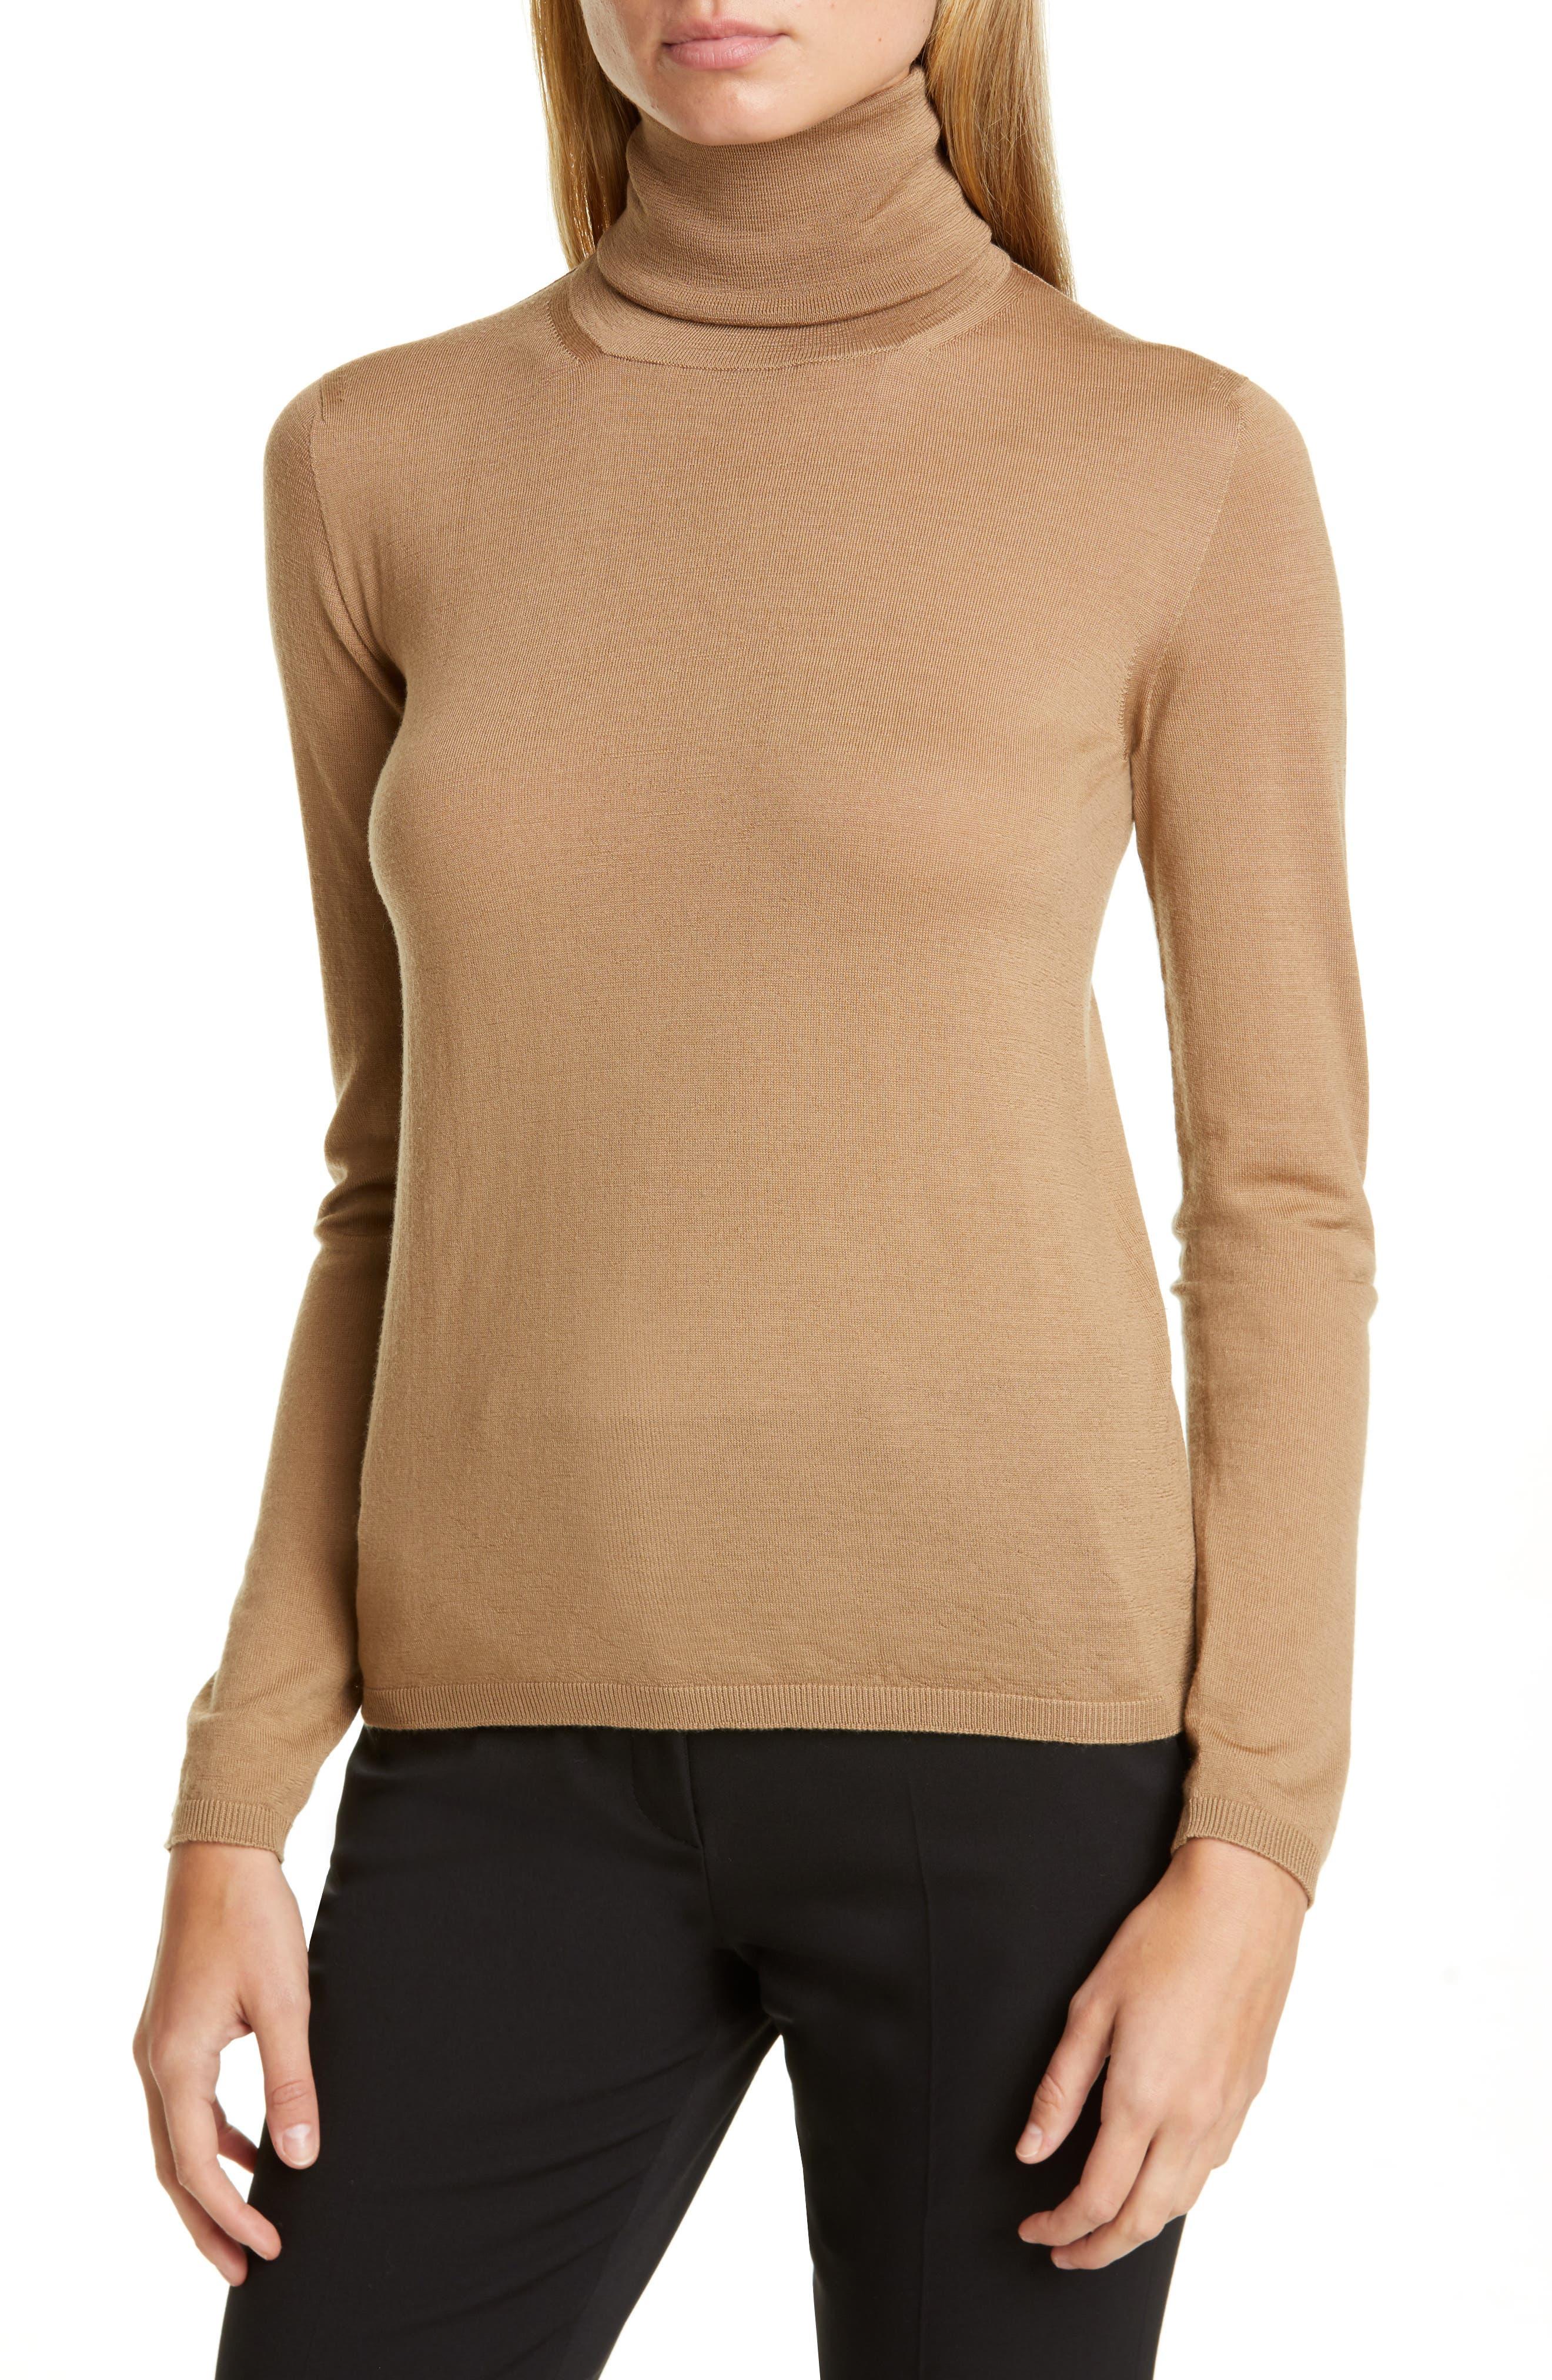 Max Mara Tops Kipur Wool Turtleneck Sweater